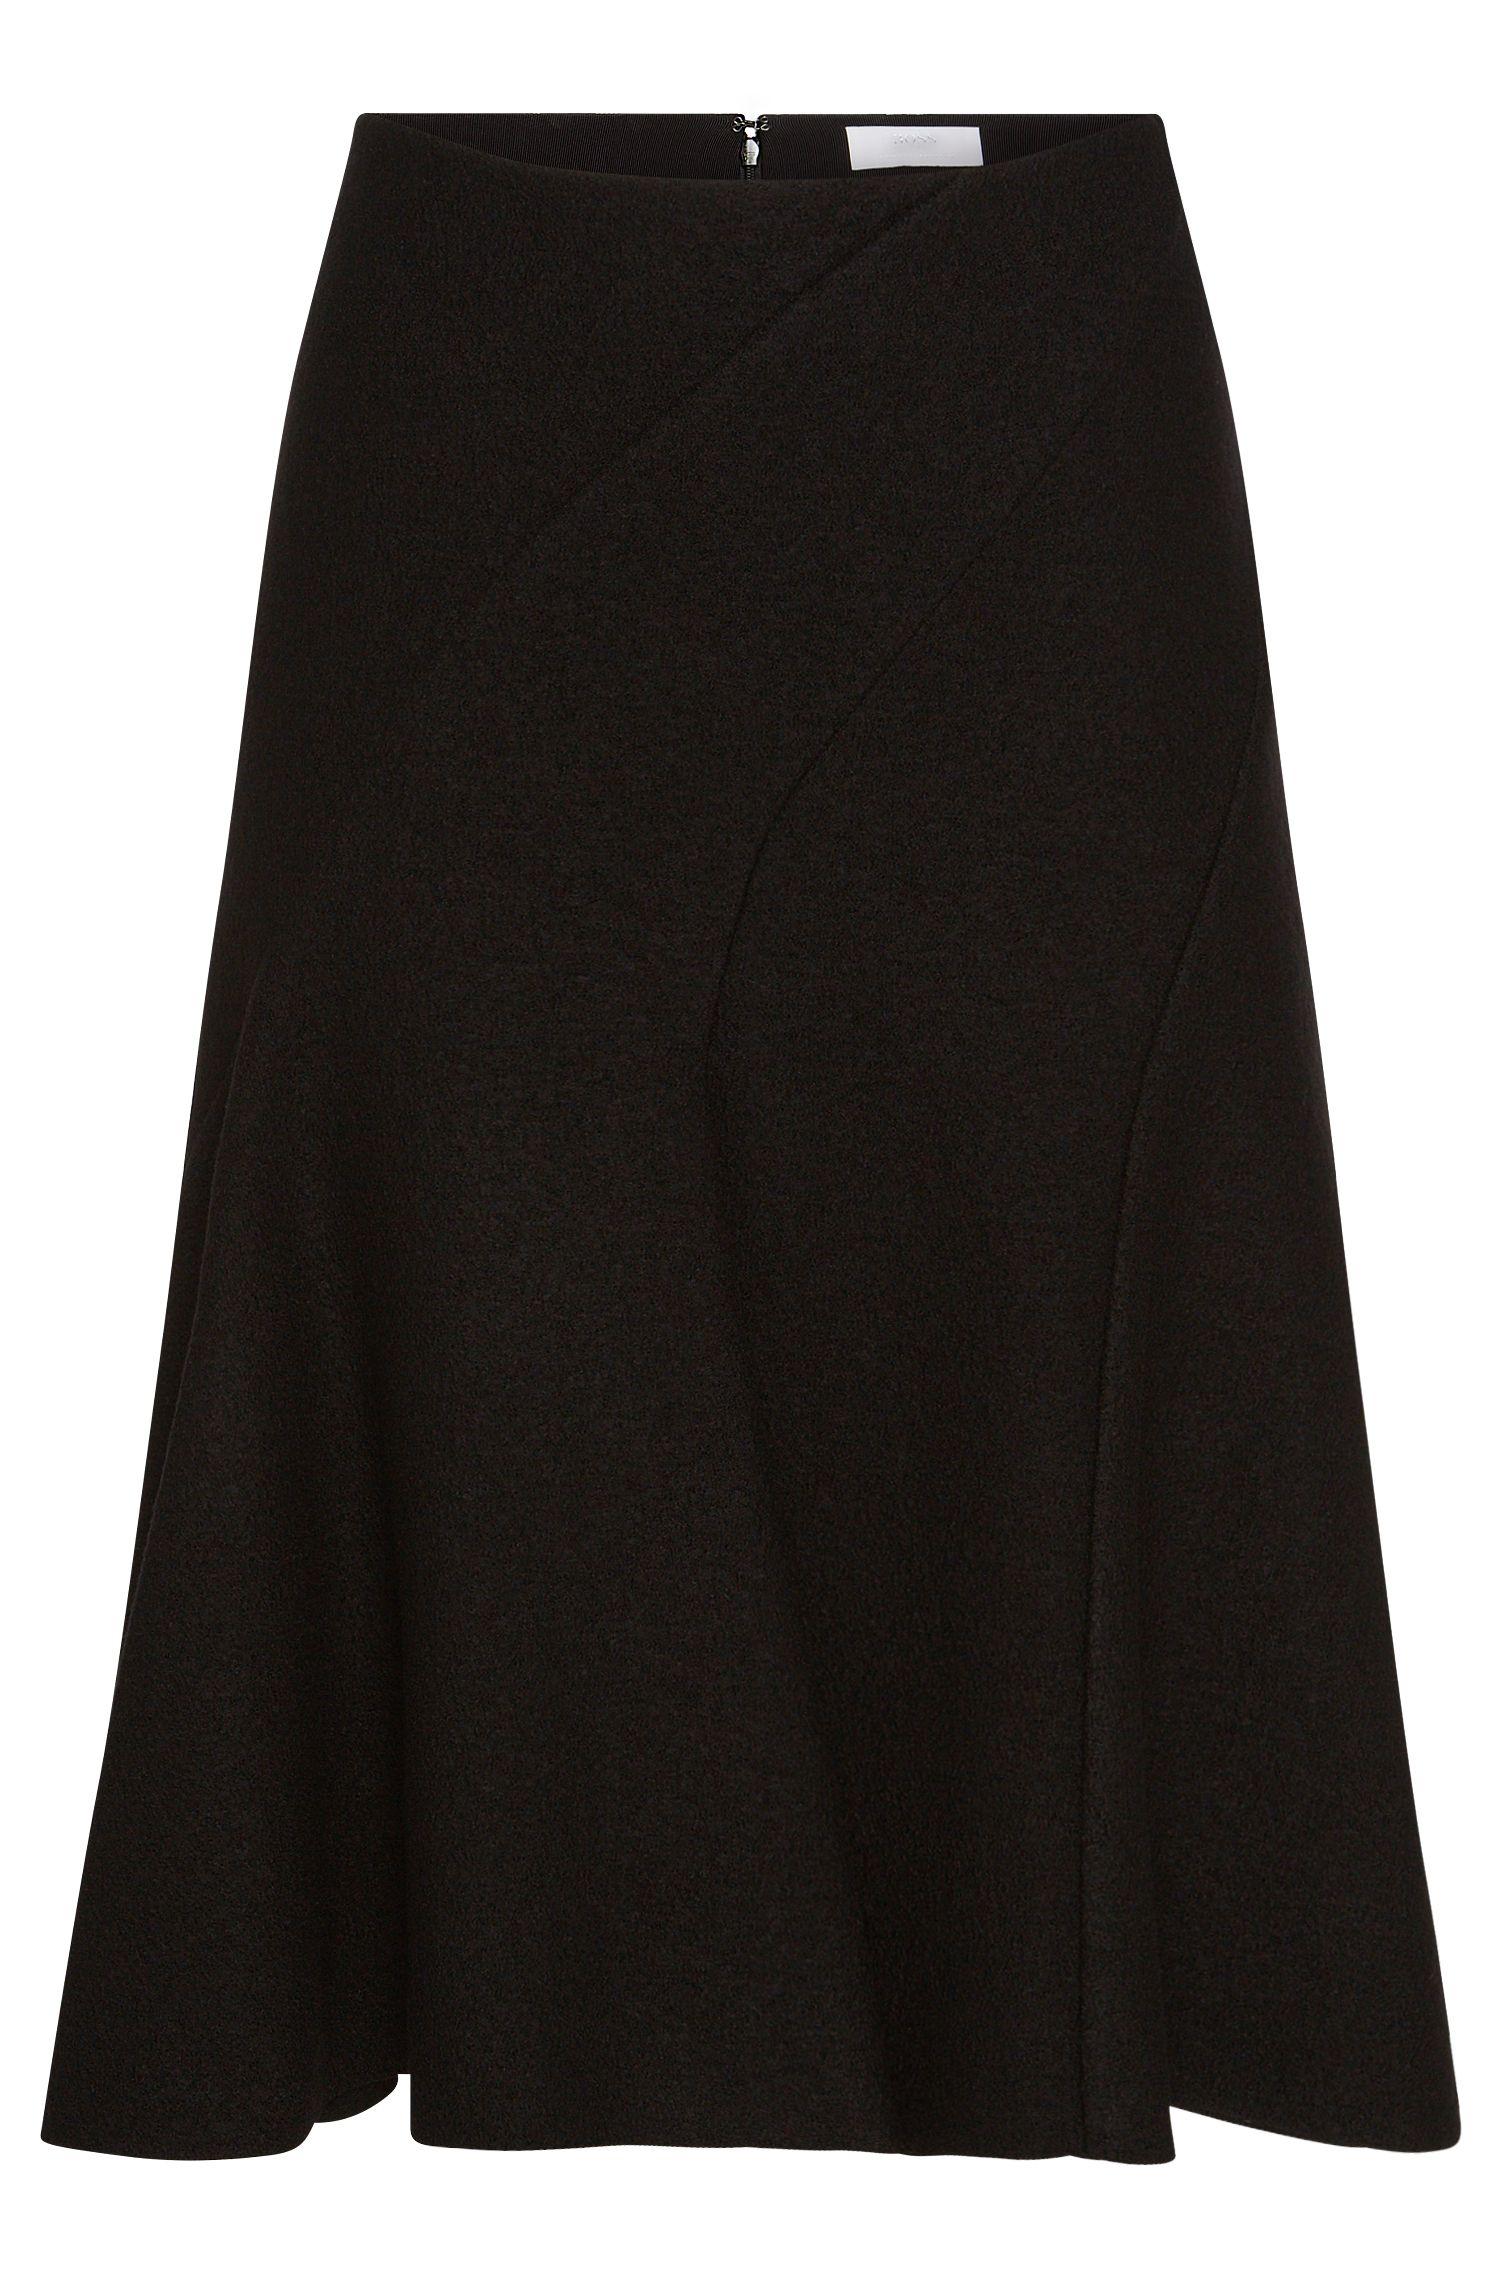 'FS_Vipera' | Bonded Wool A-Line Skirt